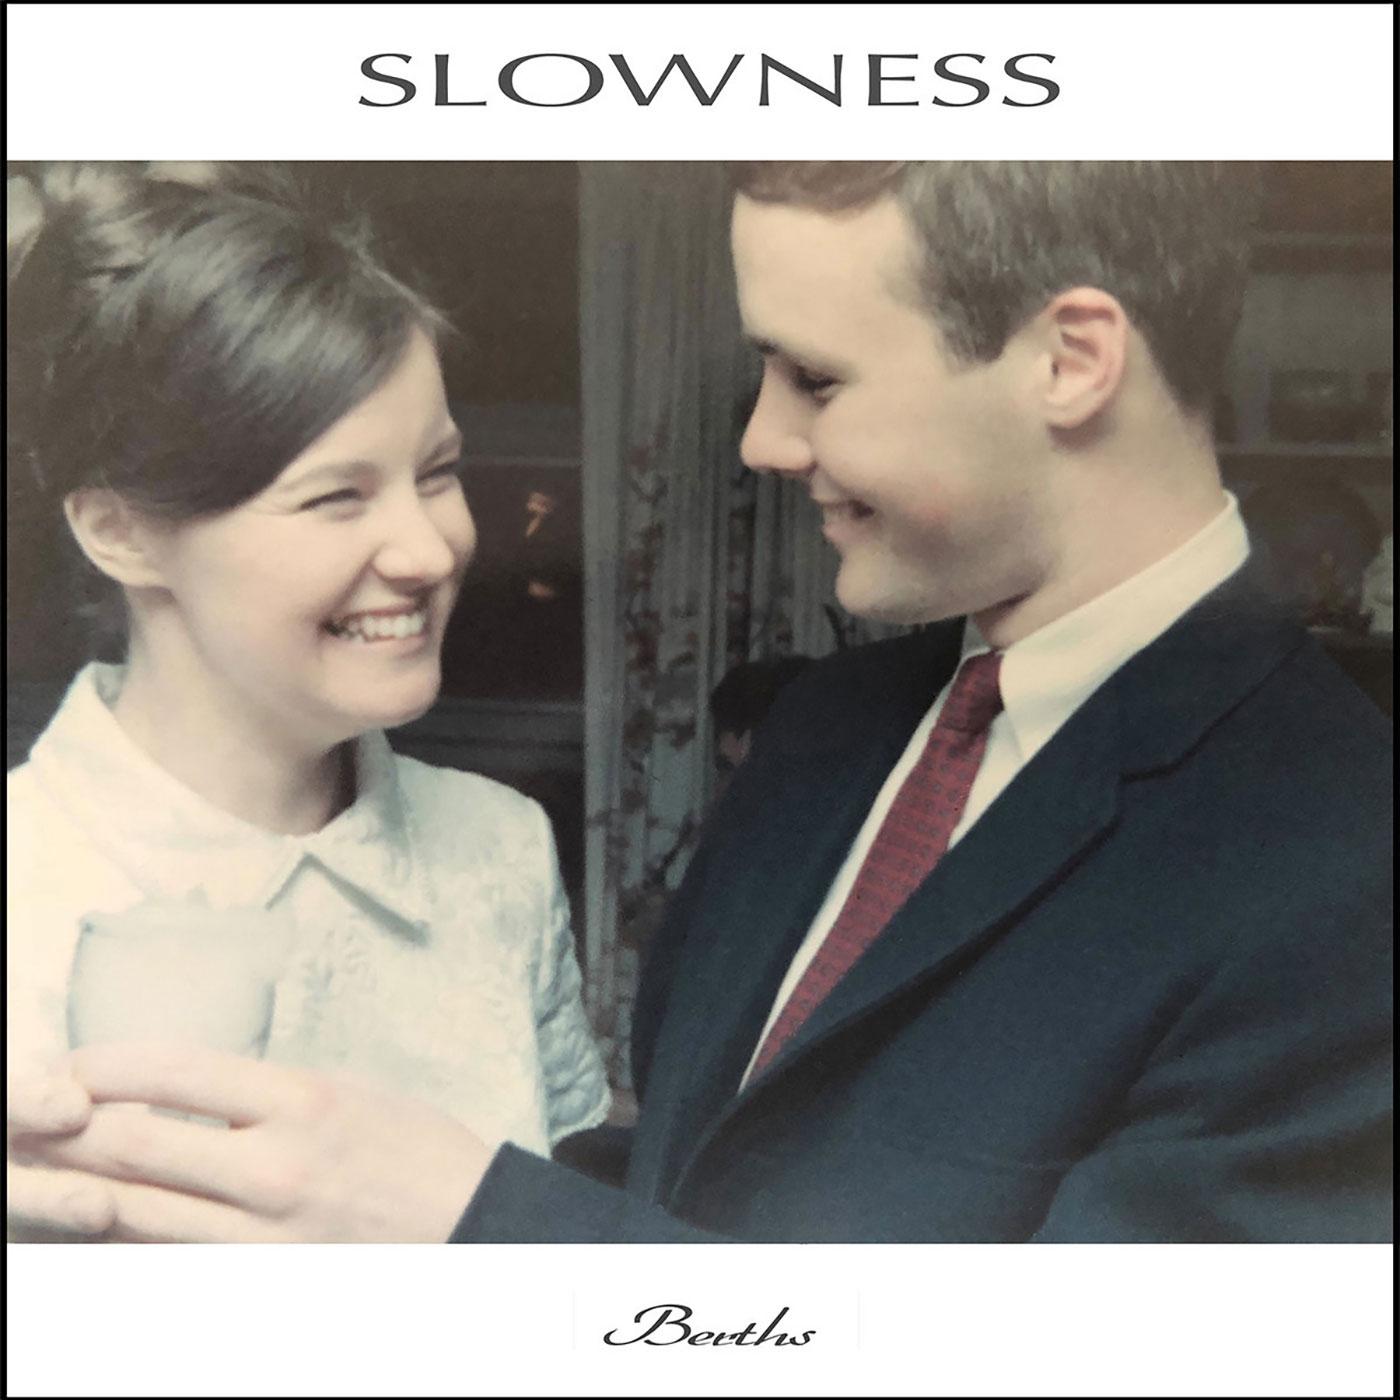 Slowness - Berths LP - Schoolkids Records